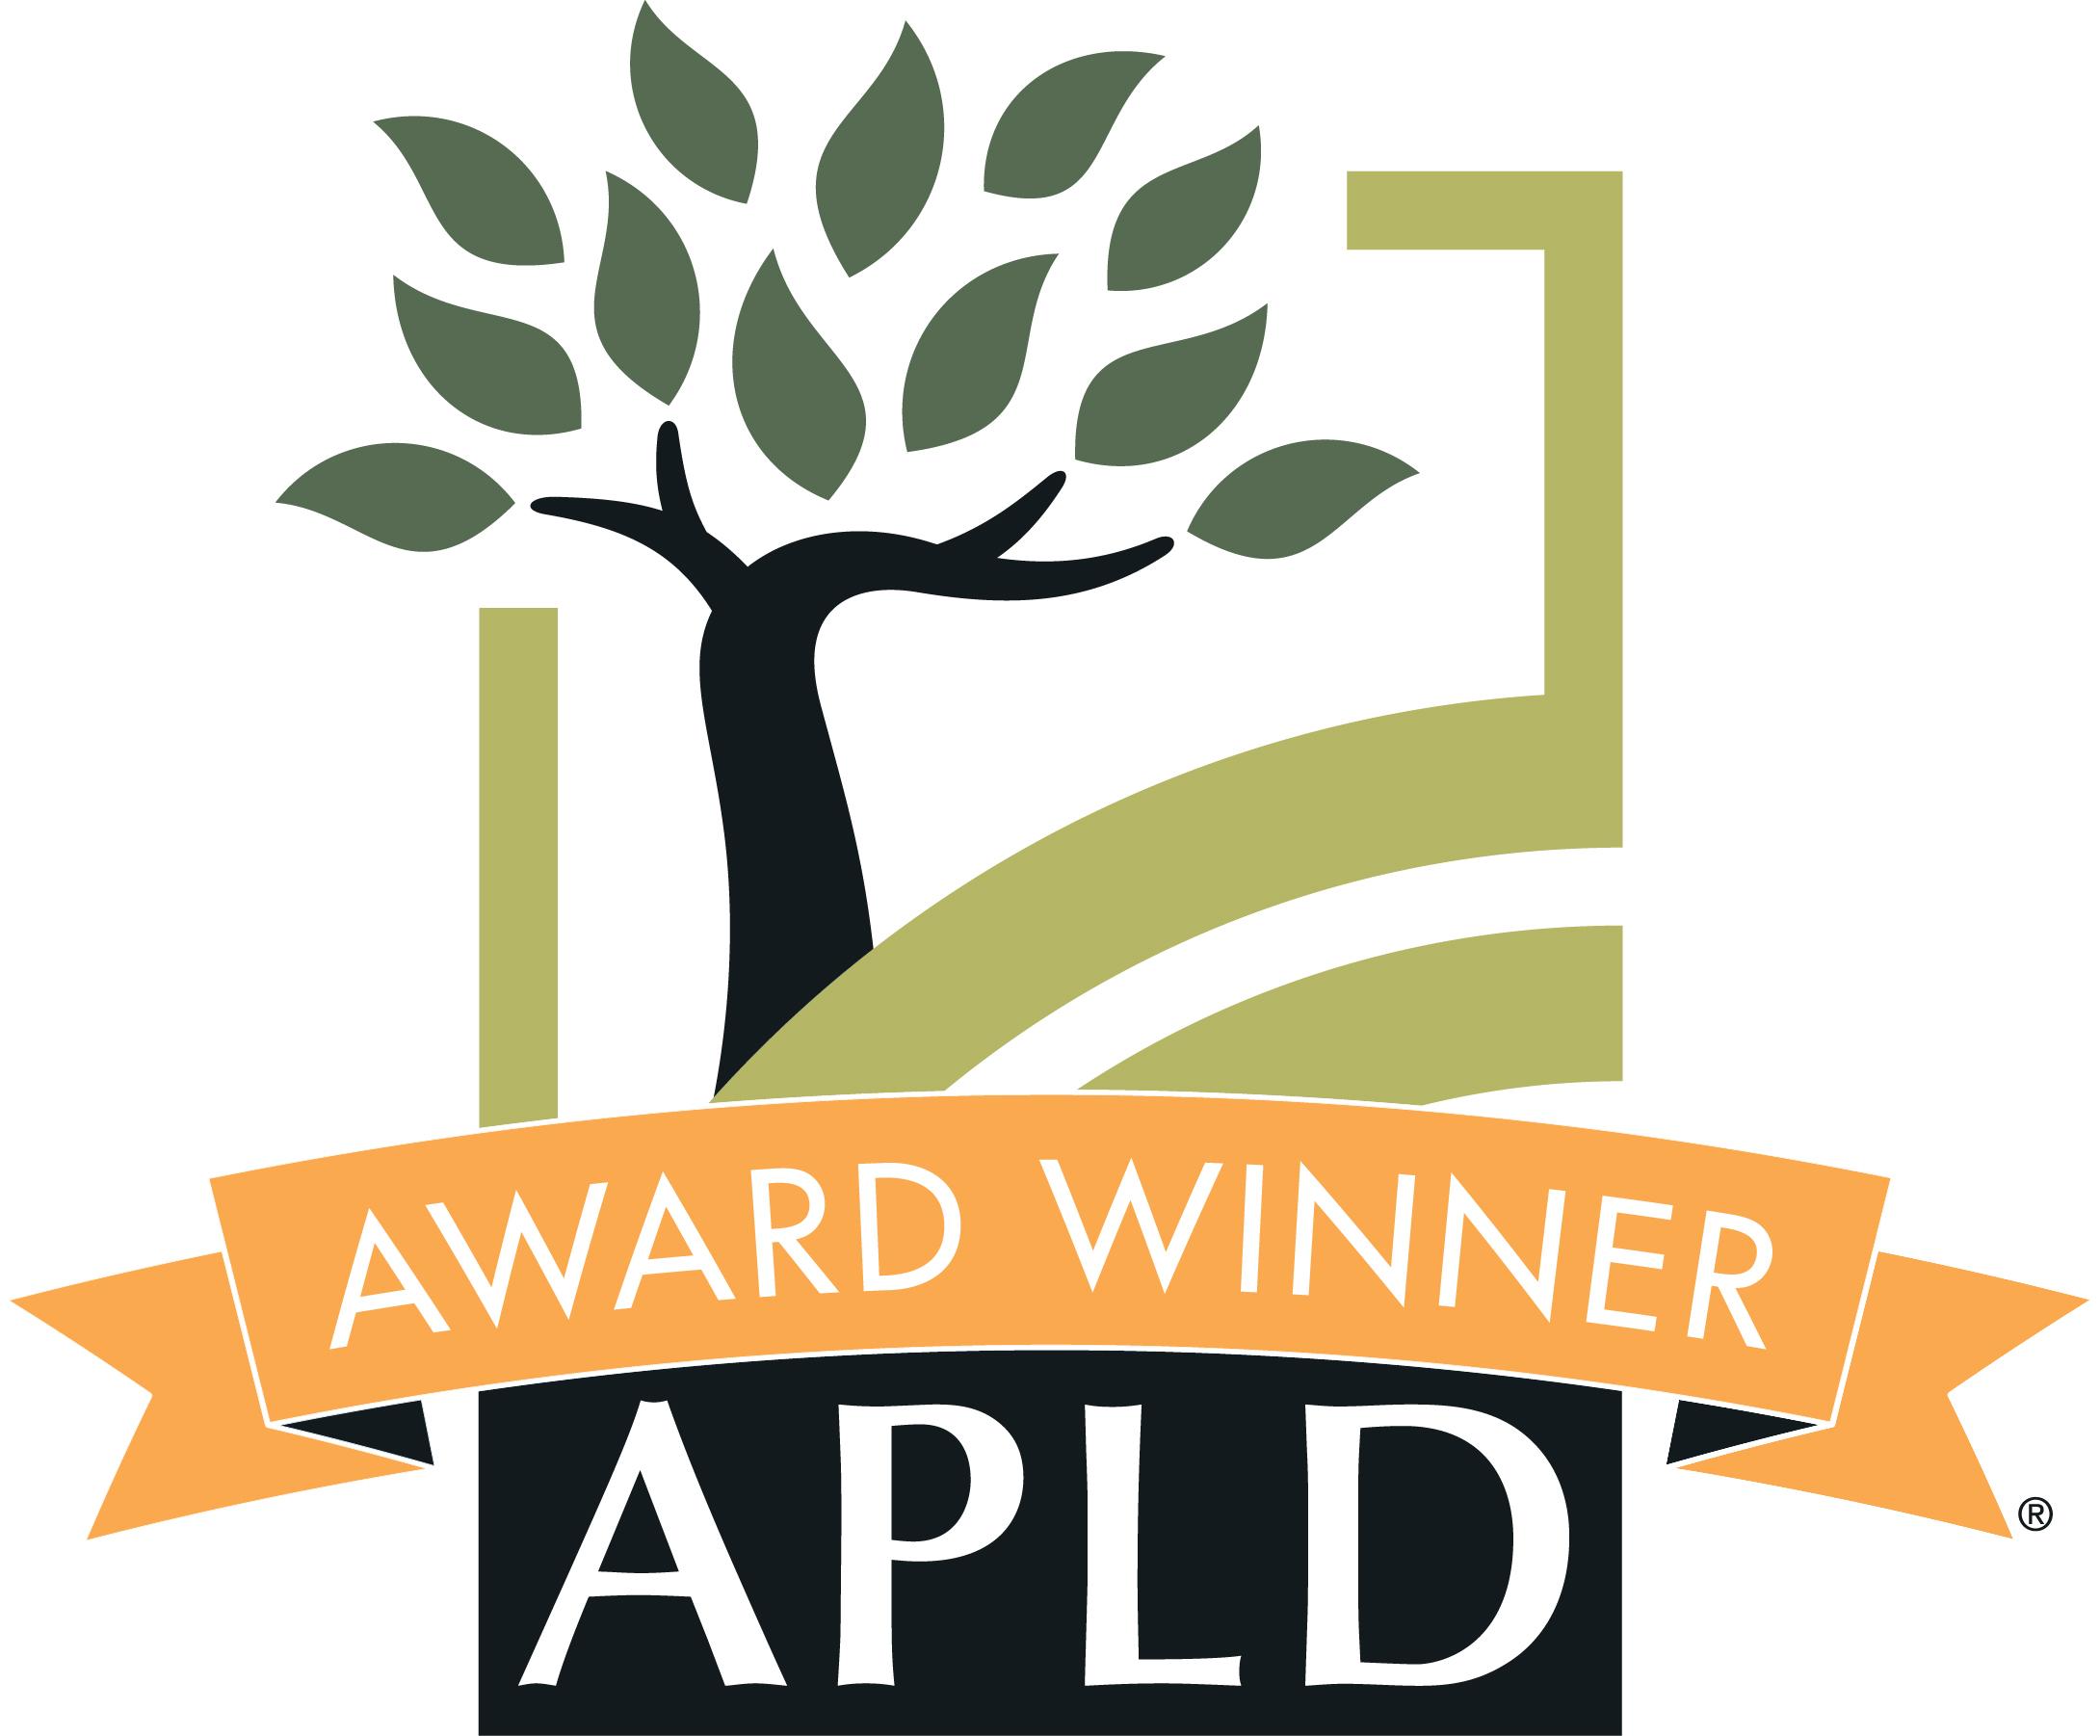 Kimberly Mercurio Wins APLD Award